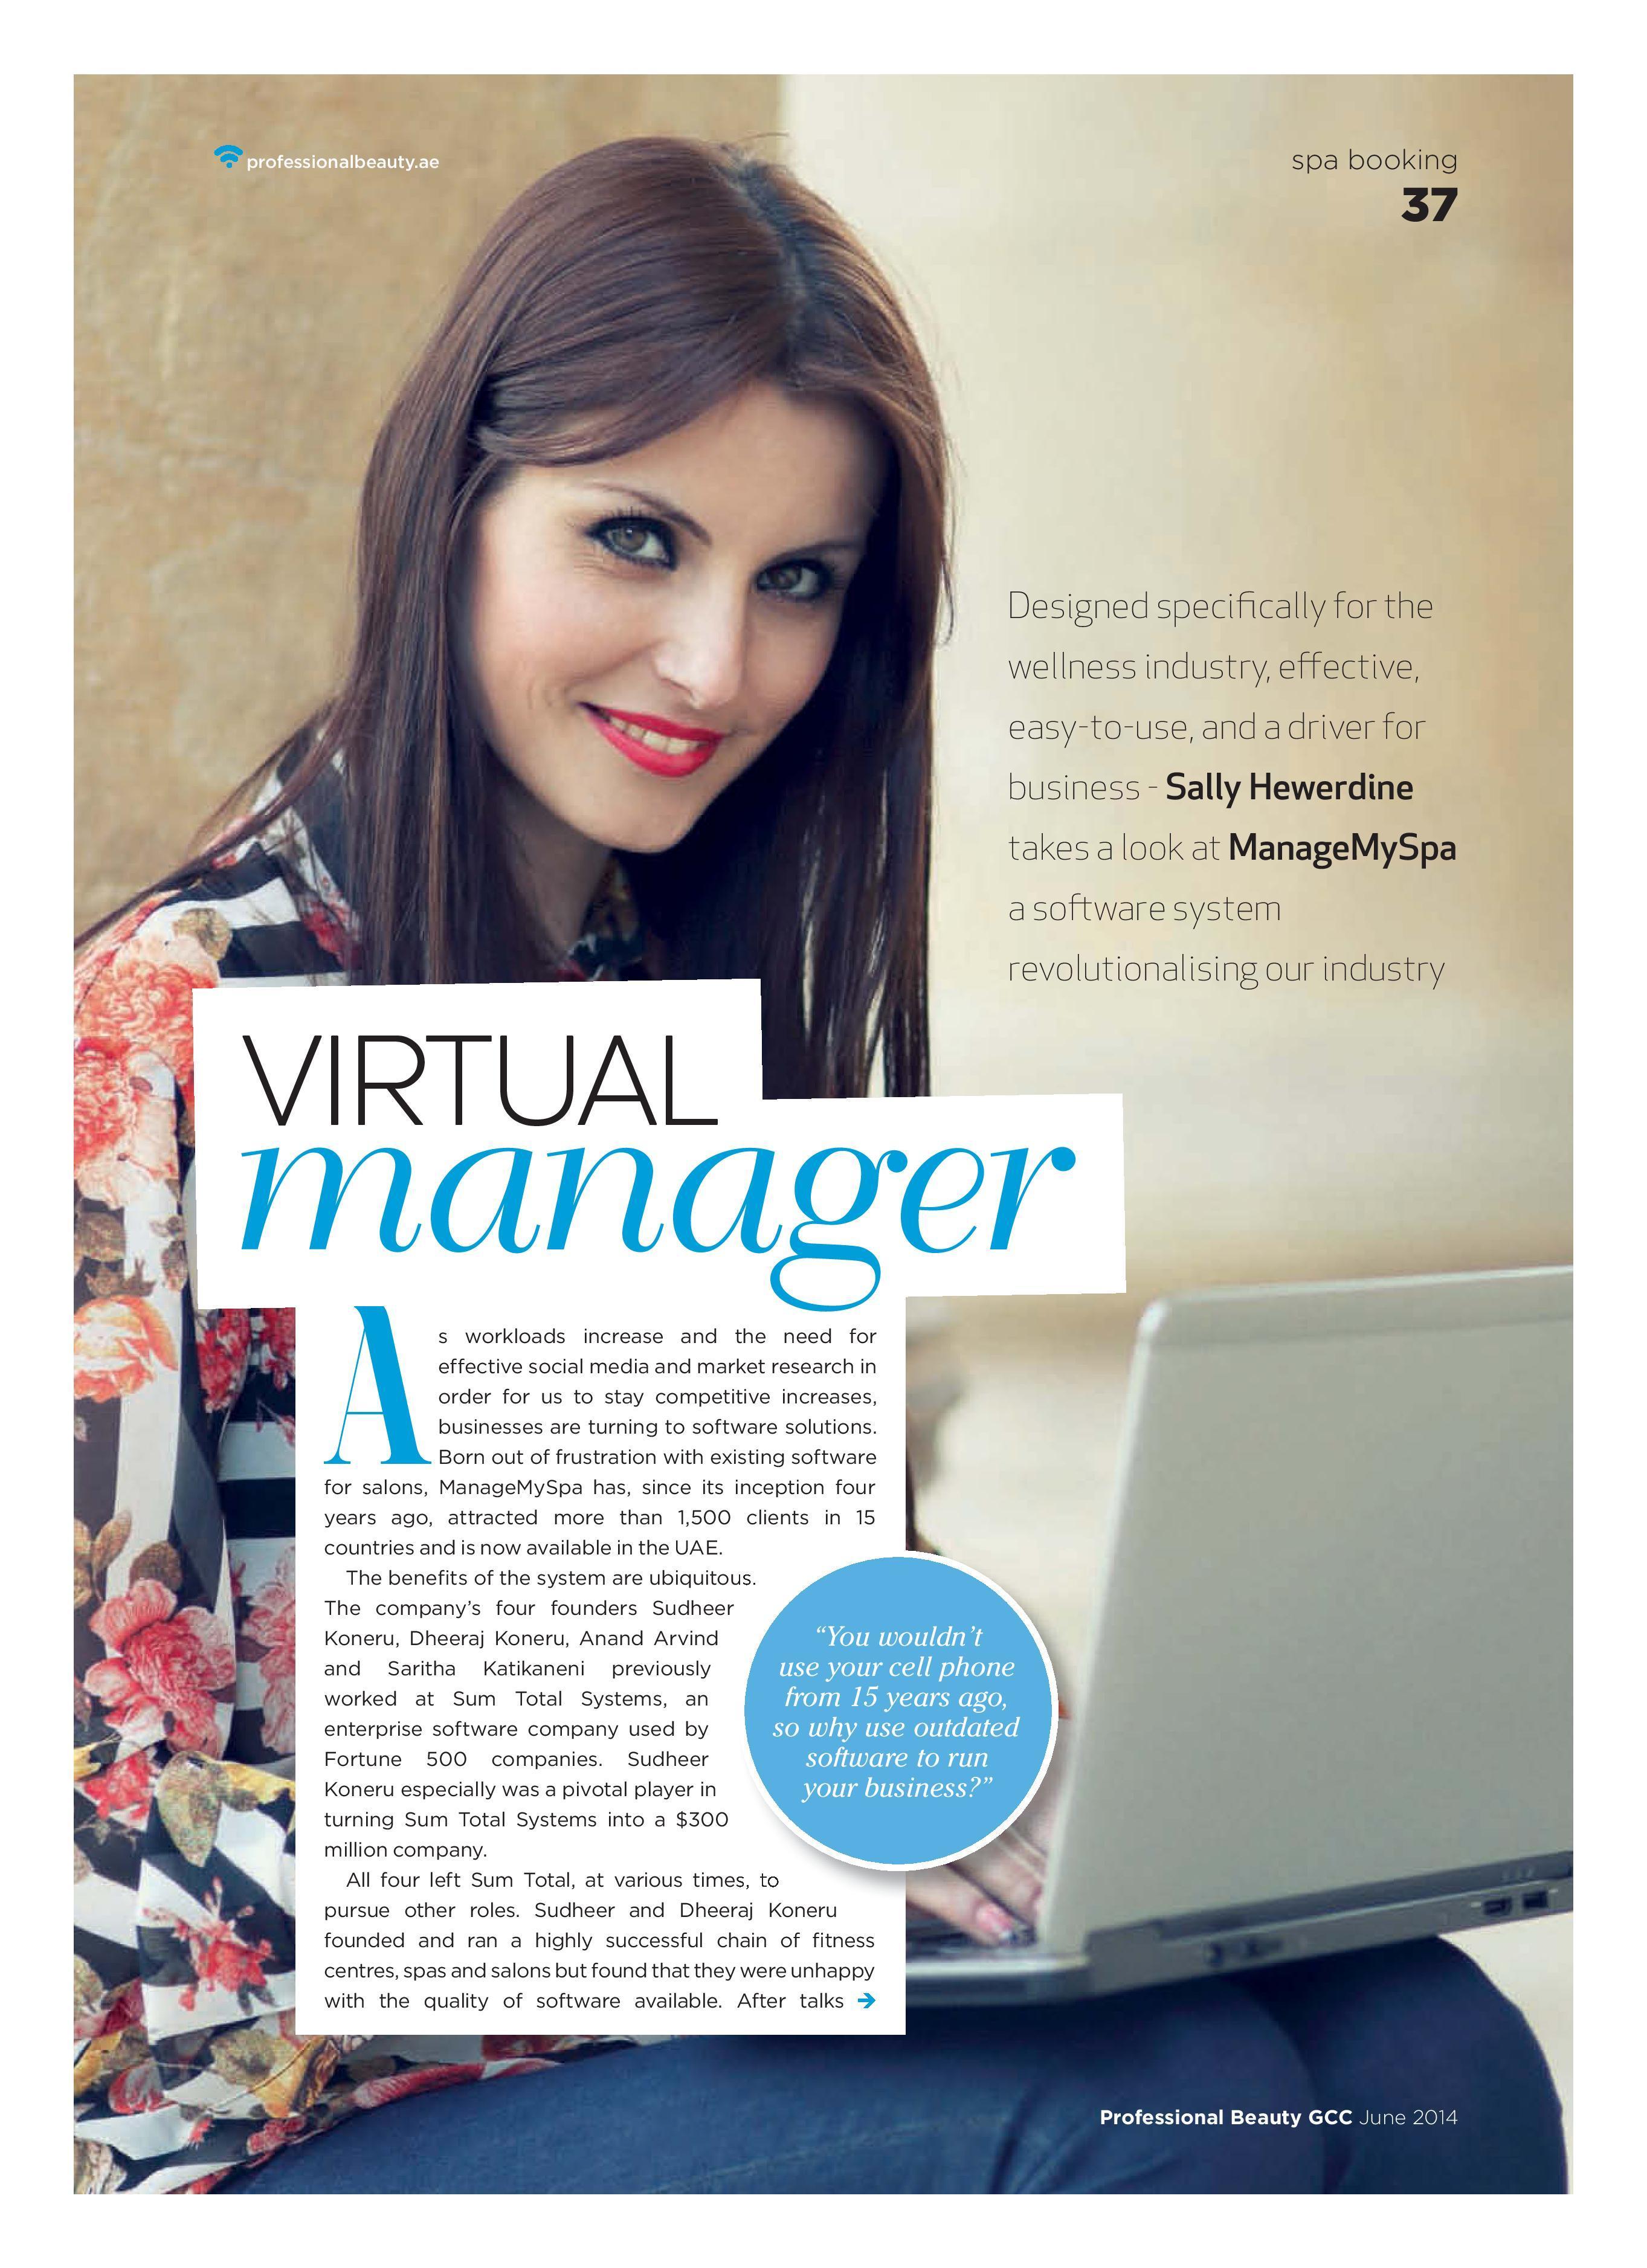 Professional Beauty Magazine Pg 39